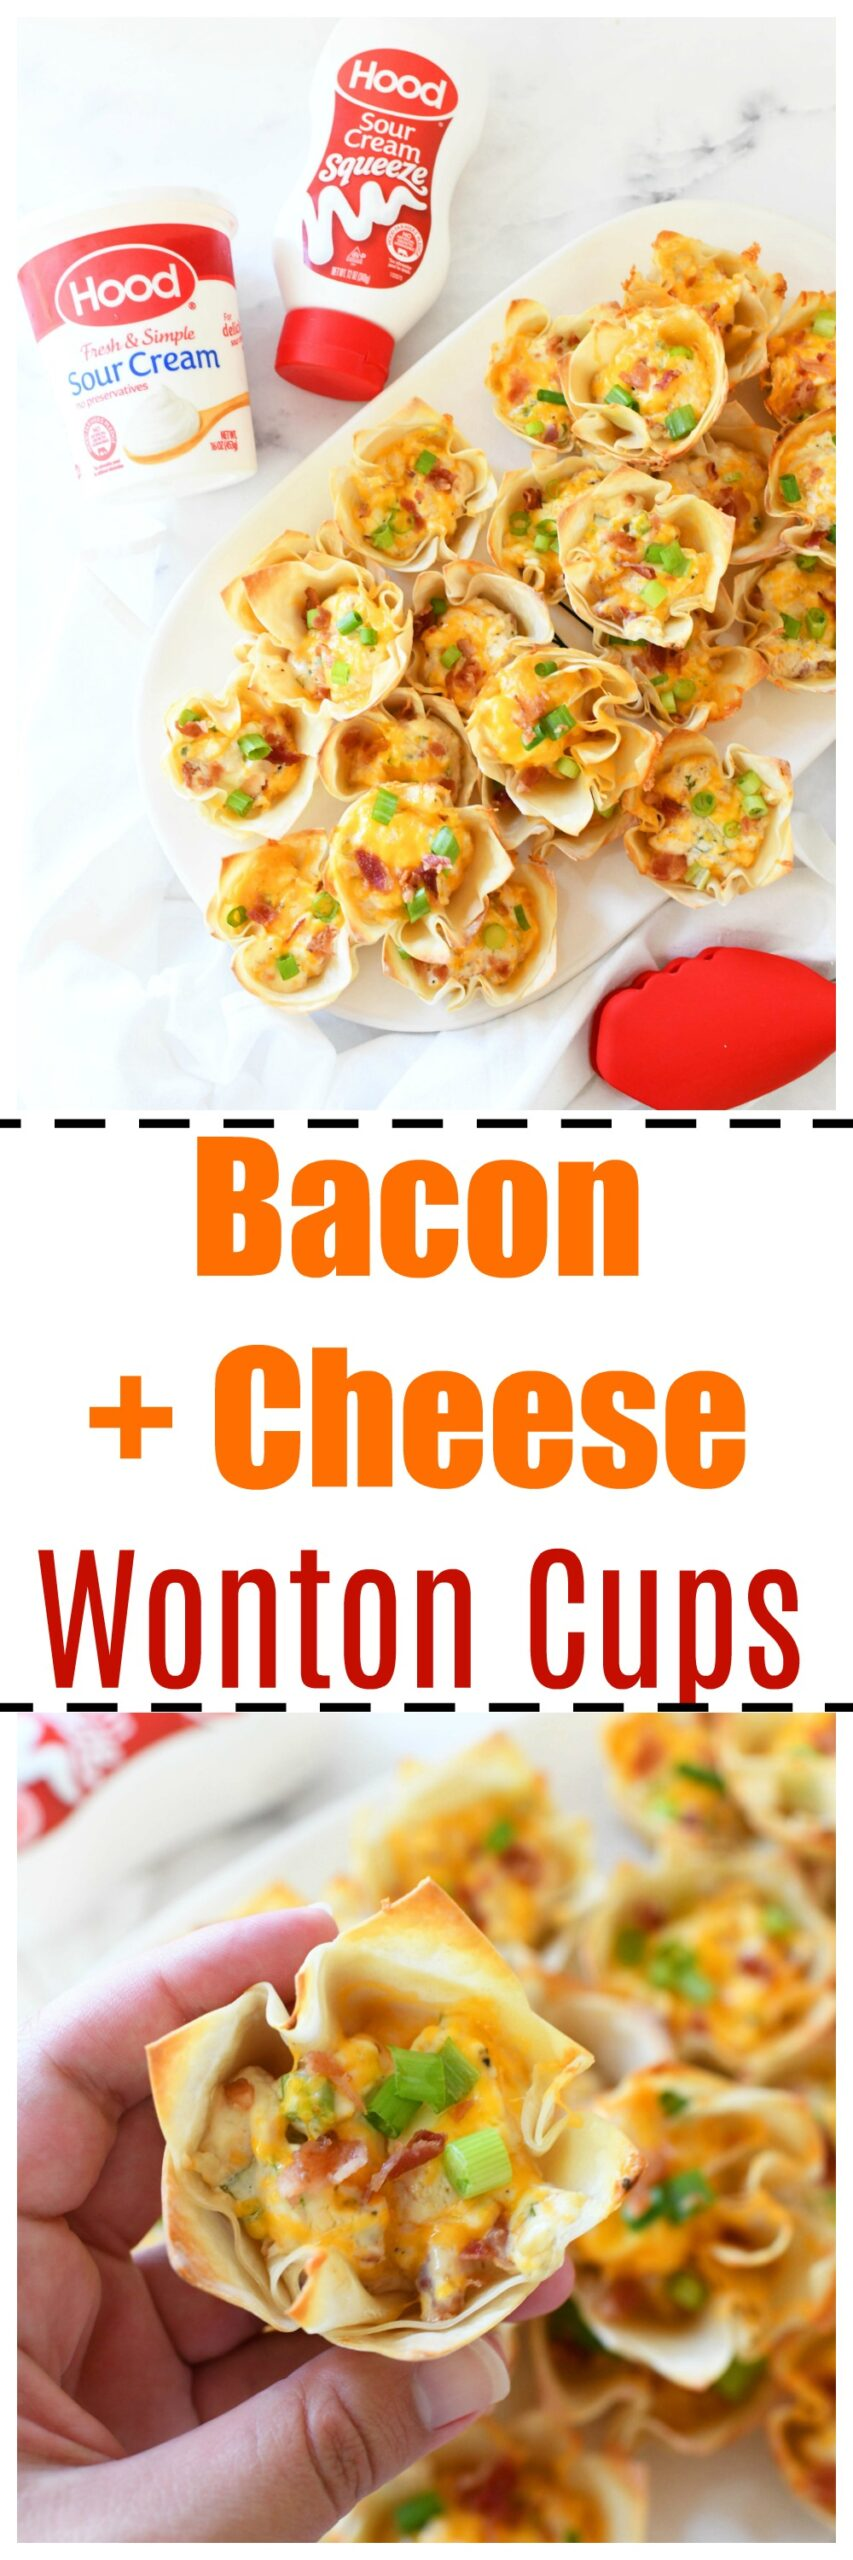 Bacon & Cheese Wontons